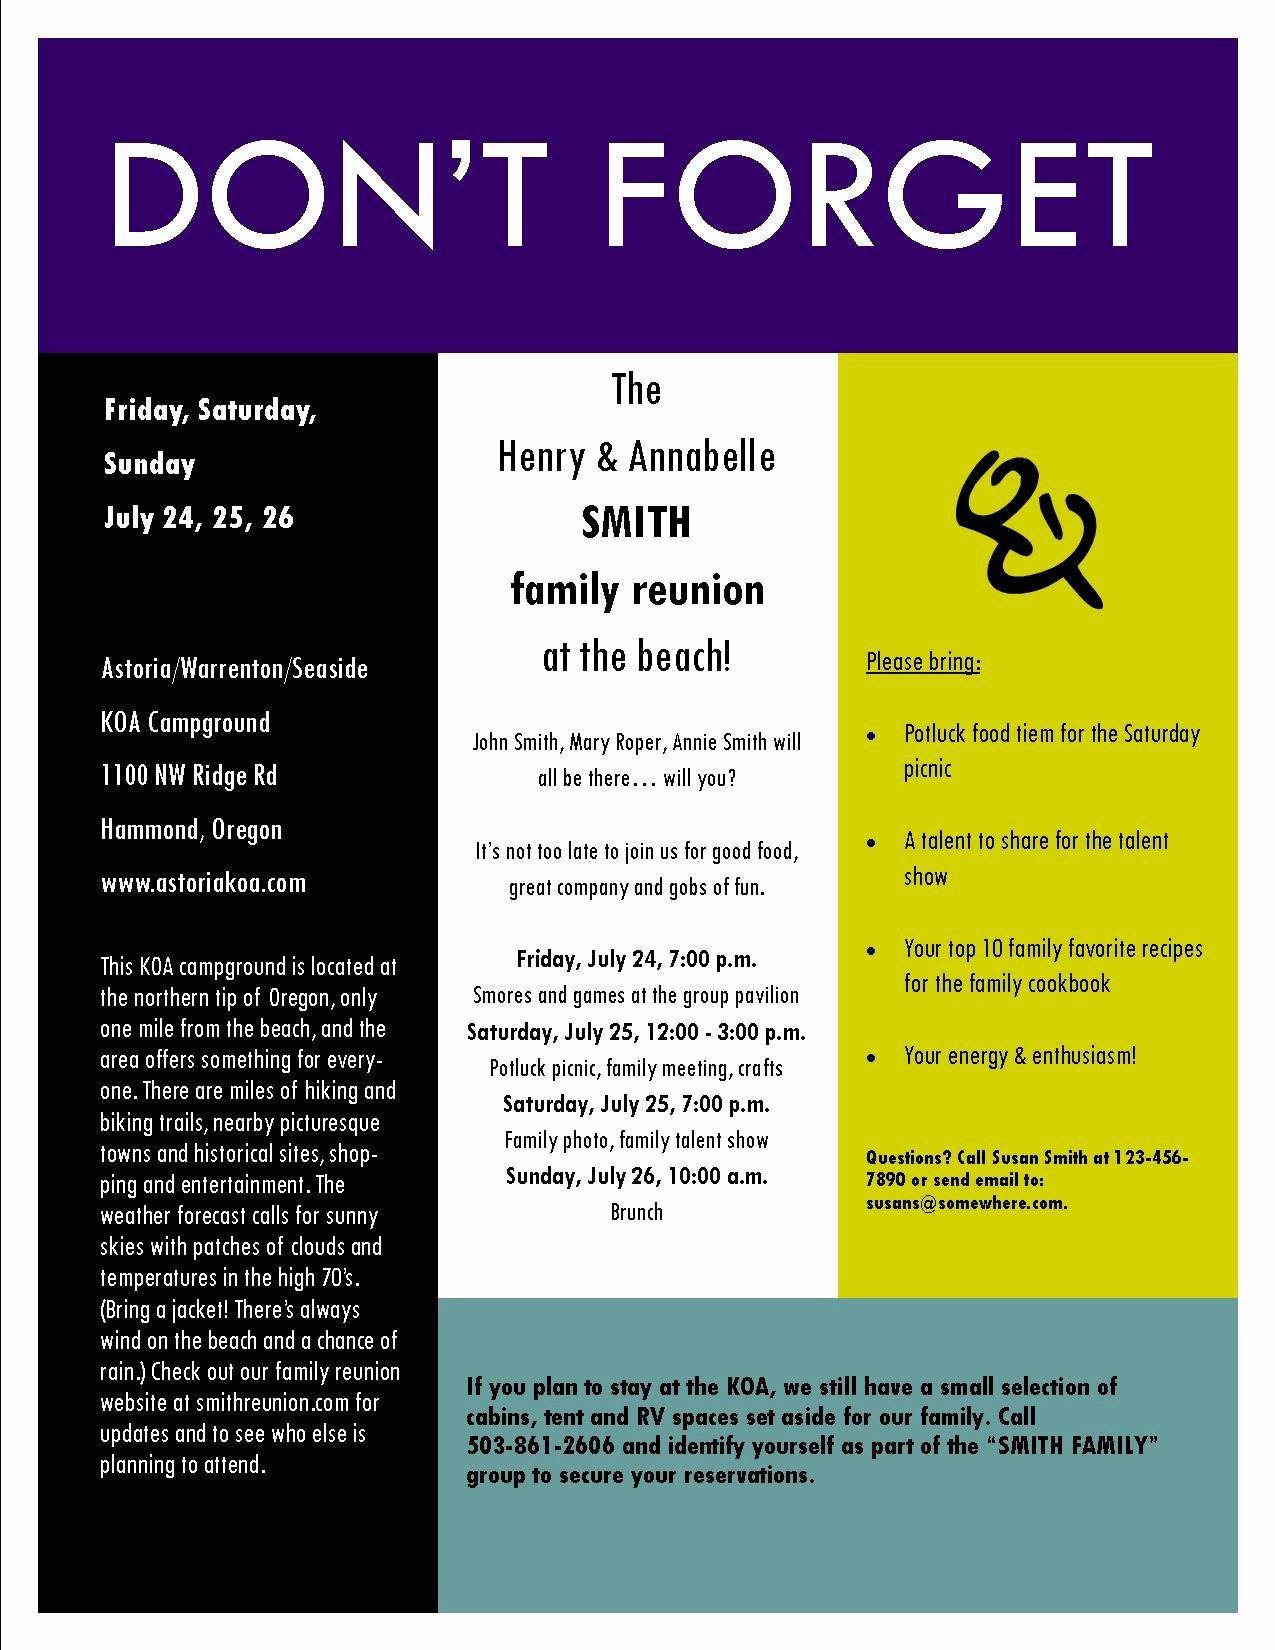 Free Family Reunion Flyers Templates Luxury Free Family Reunion Flyer Template Yourweek 0de2baeca25e